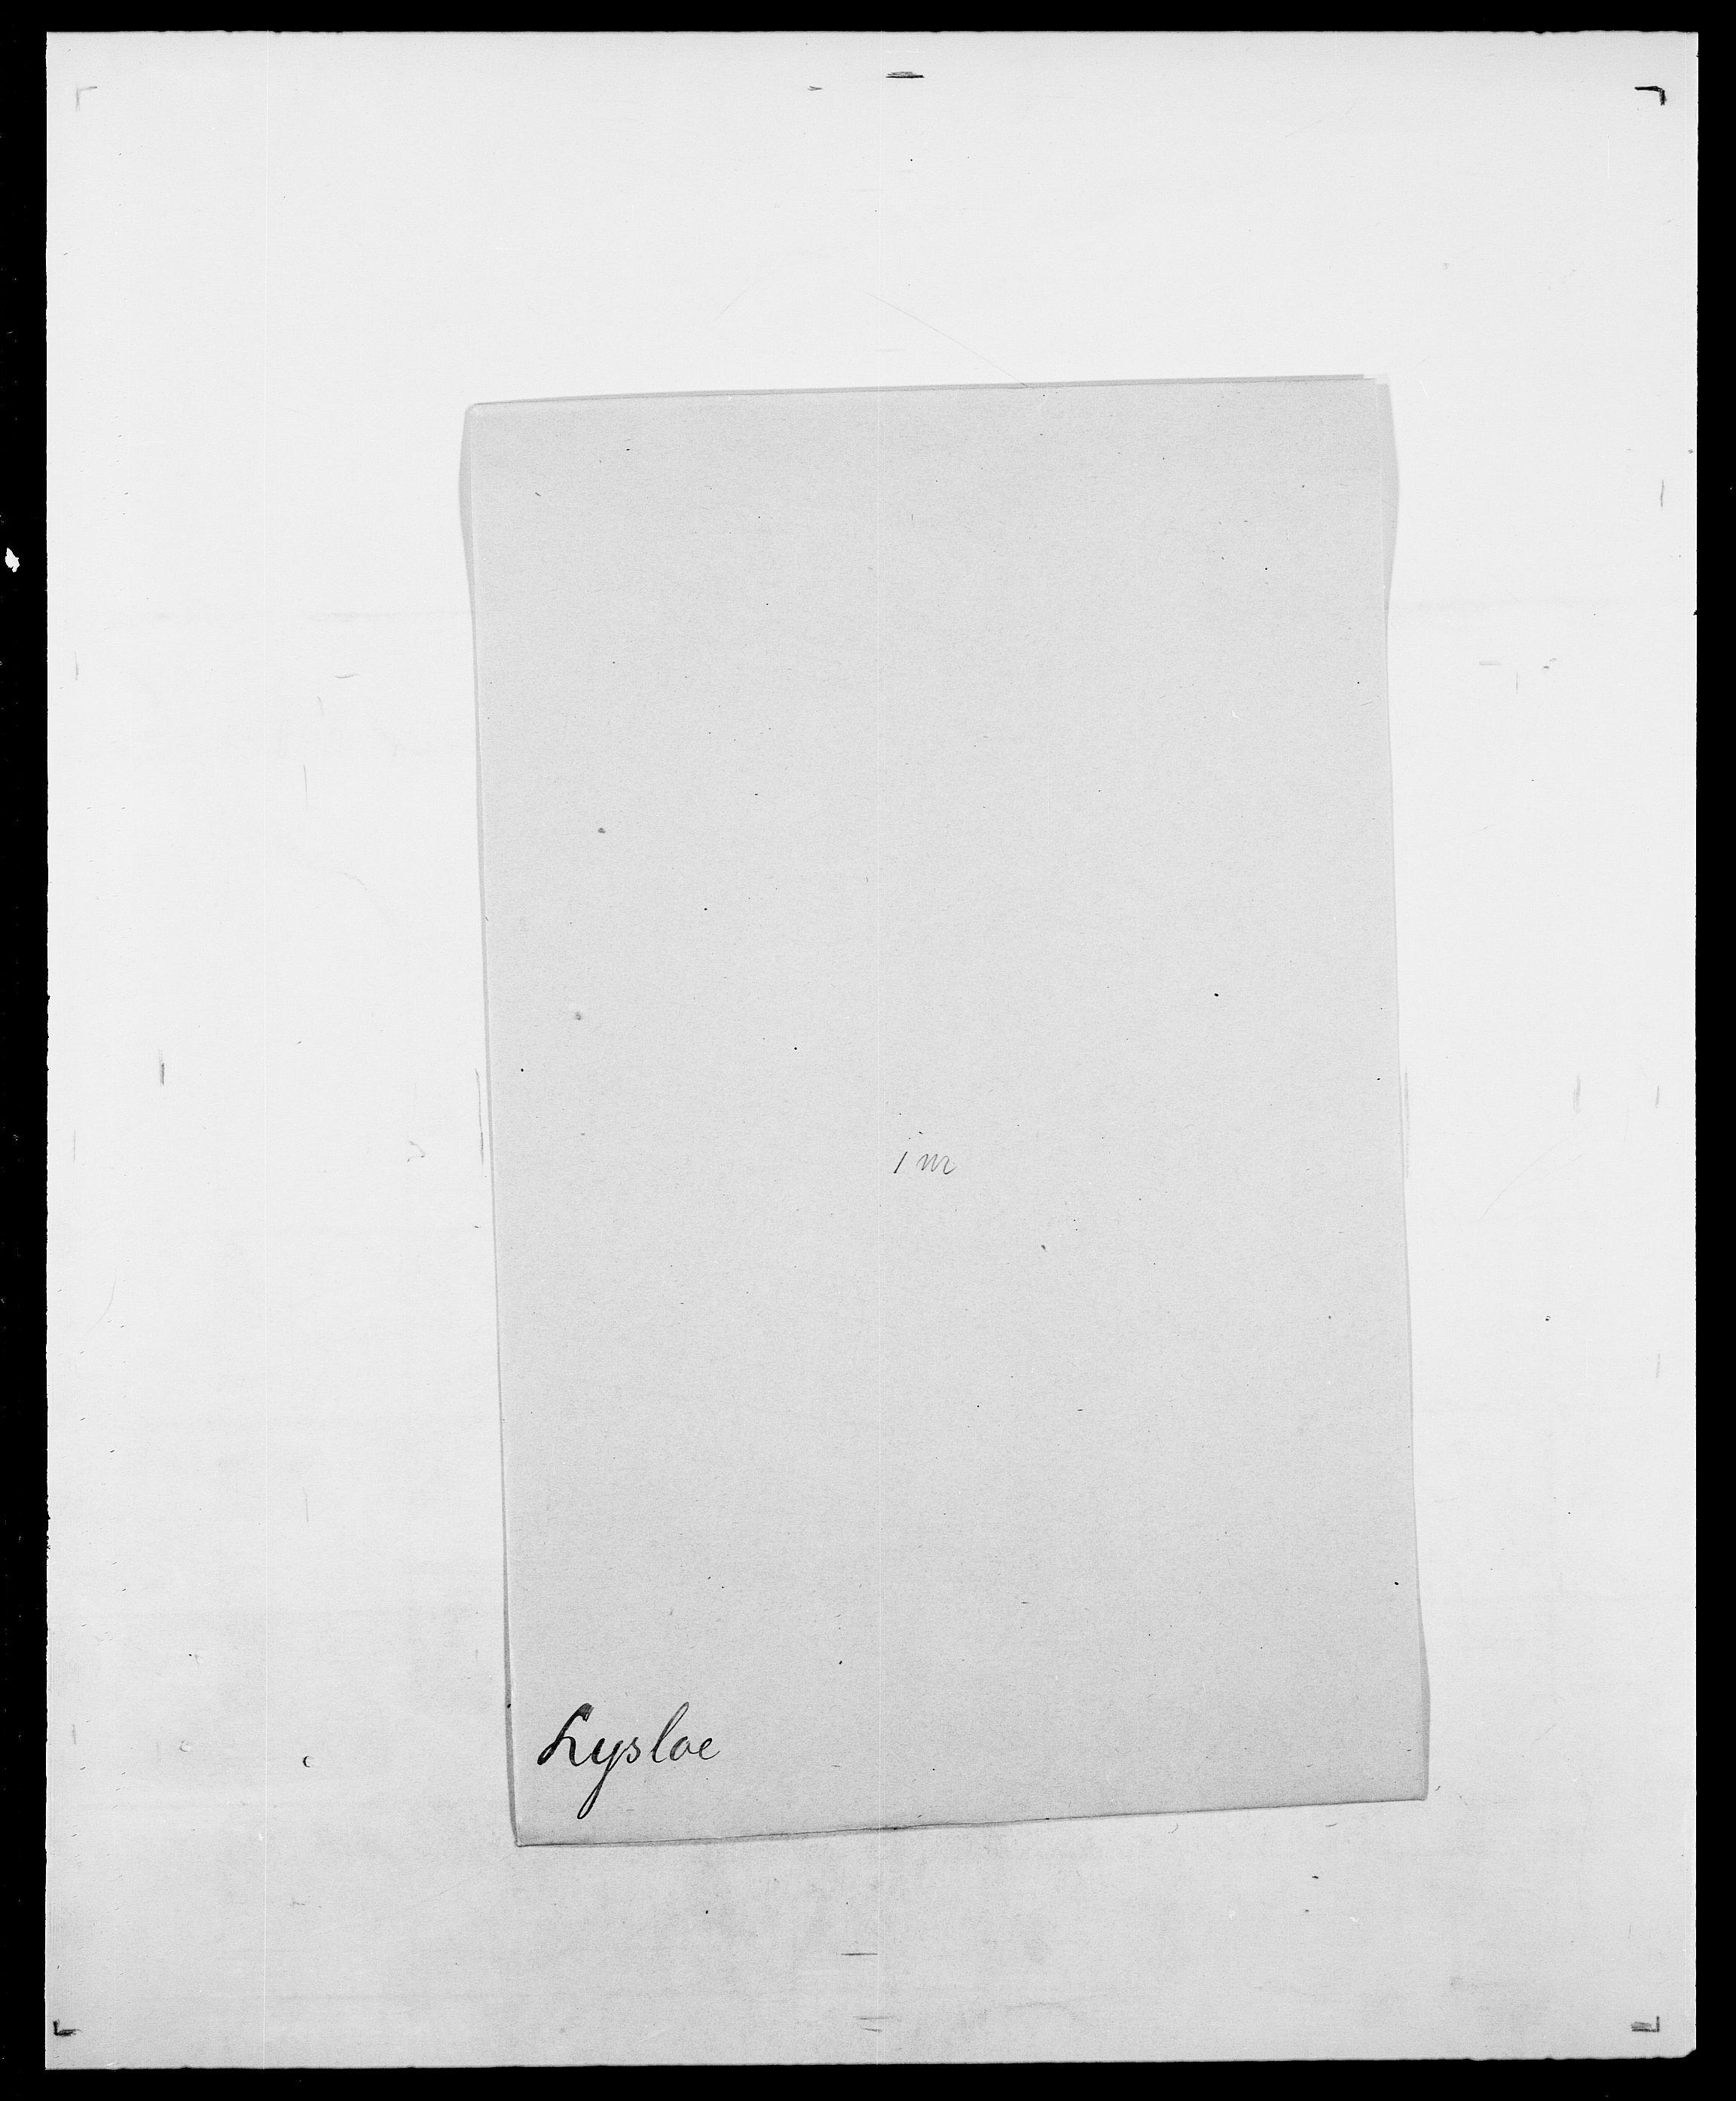 SAO, Delgobe, Charles Antoine - samling, D/Da/L0024: Lobech - Lærum, s. 778